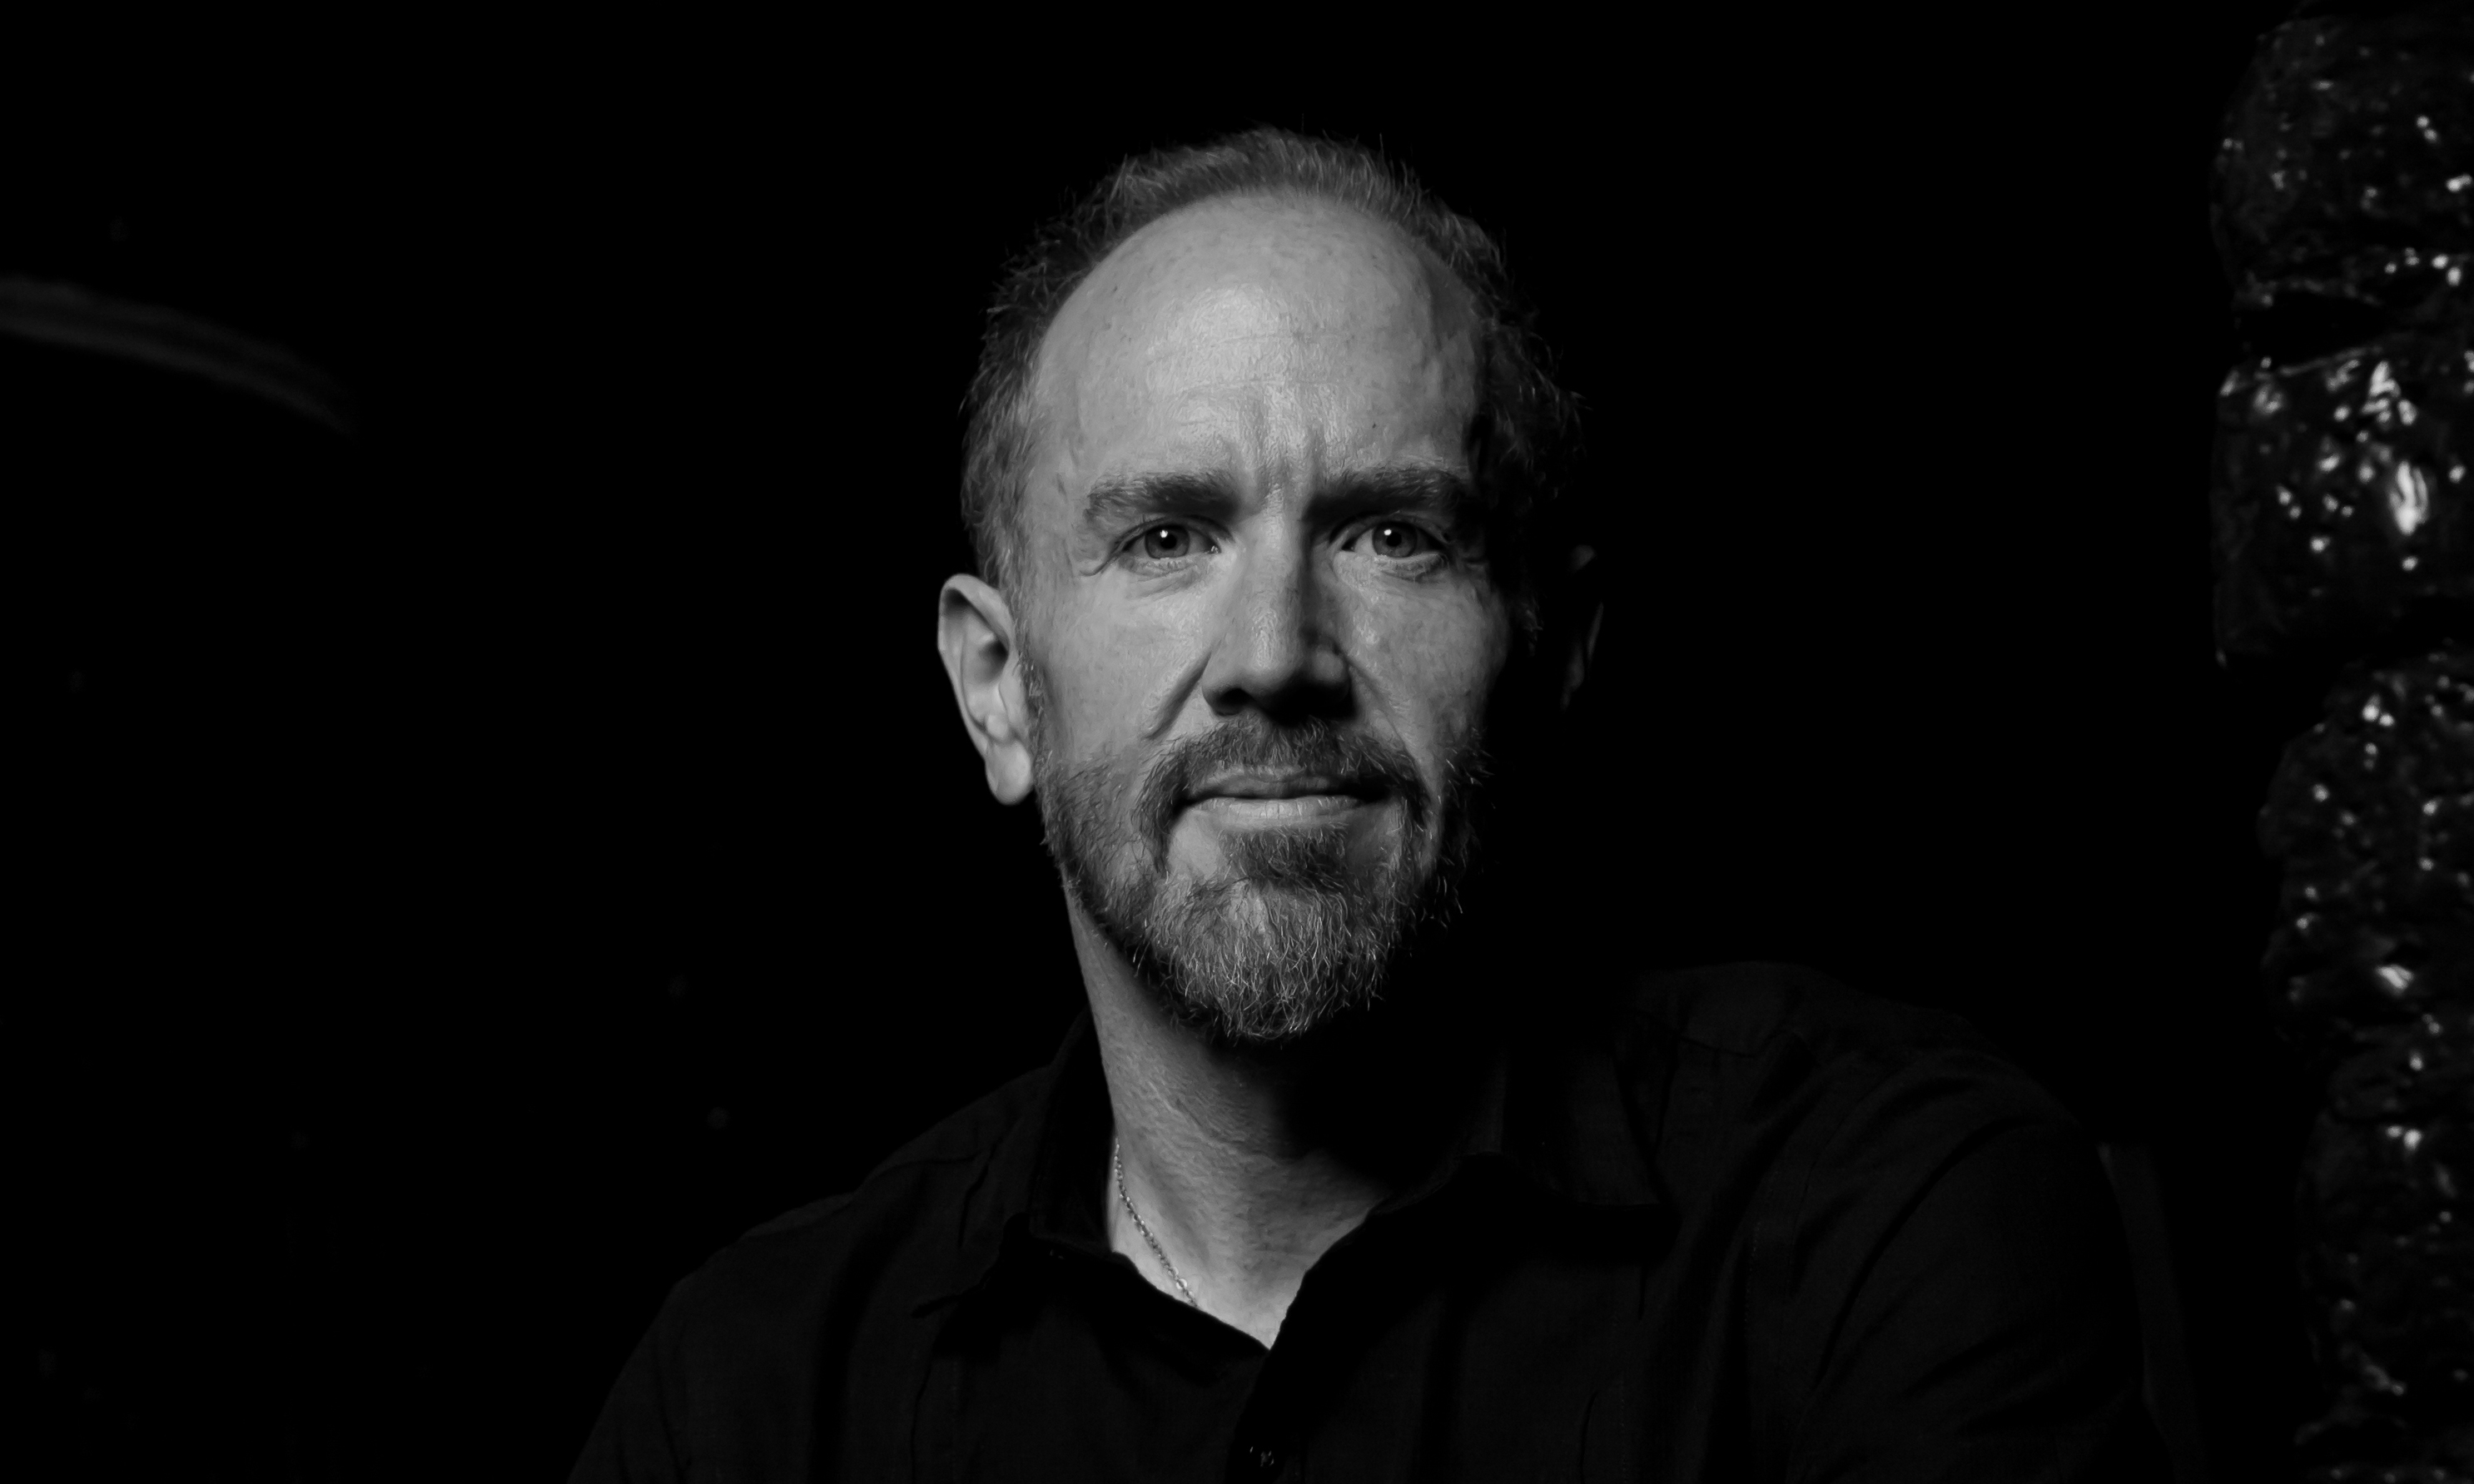 Mike Masse, photo by Jim Mimna